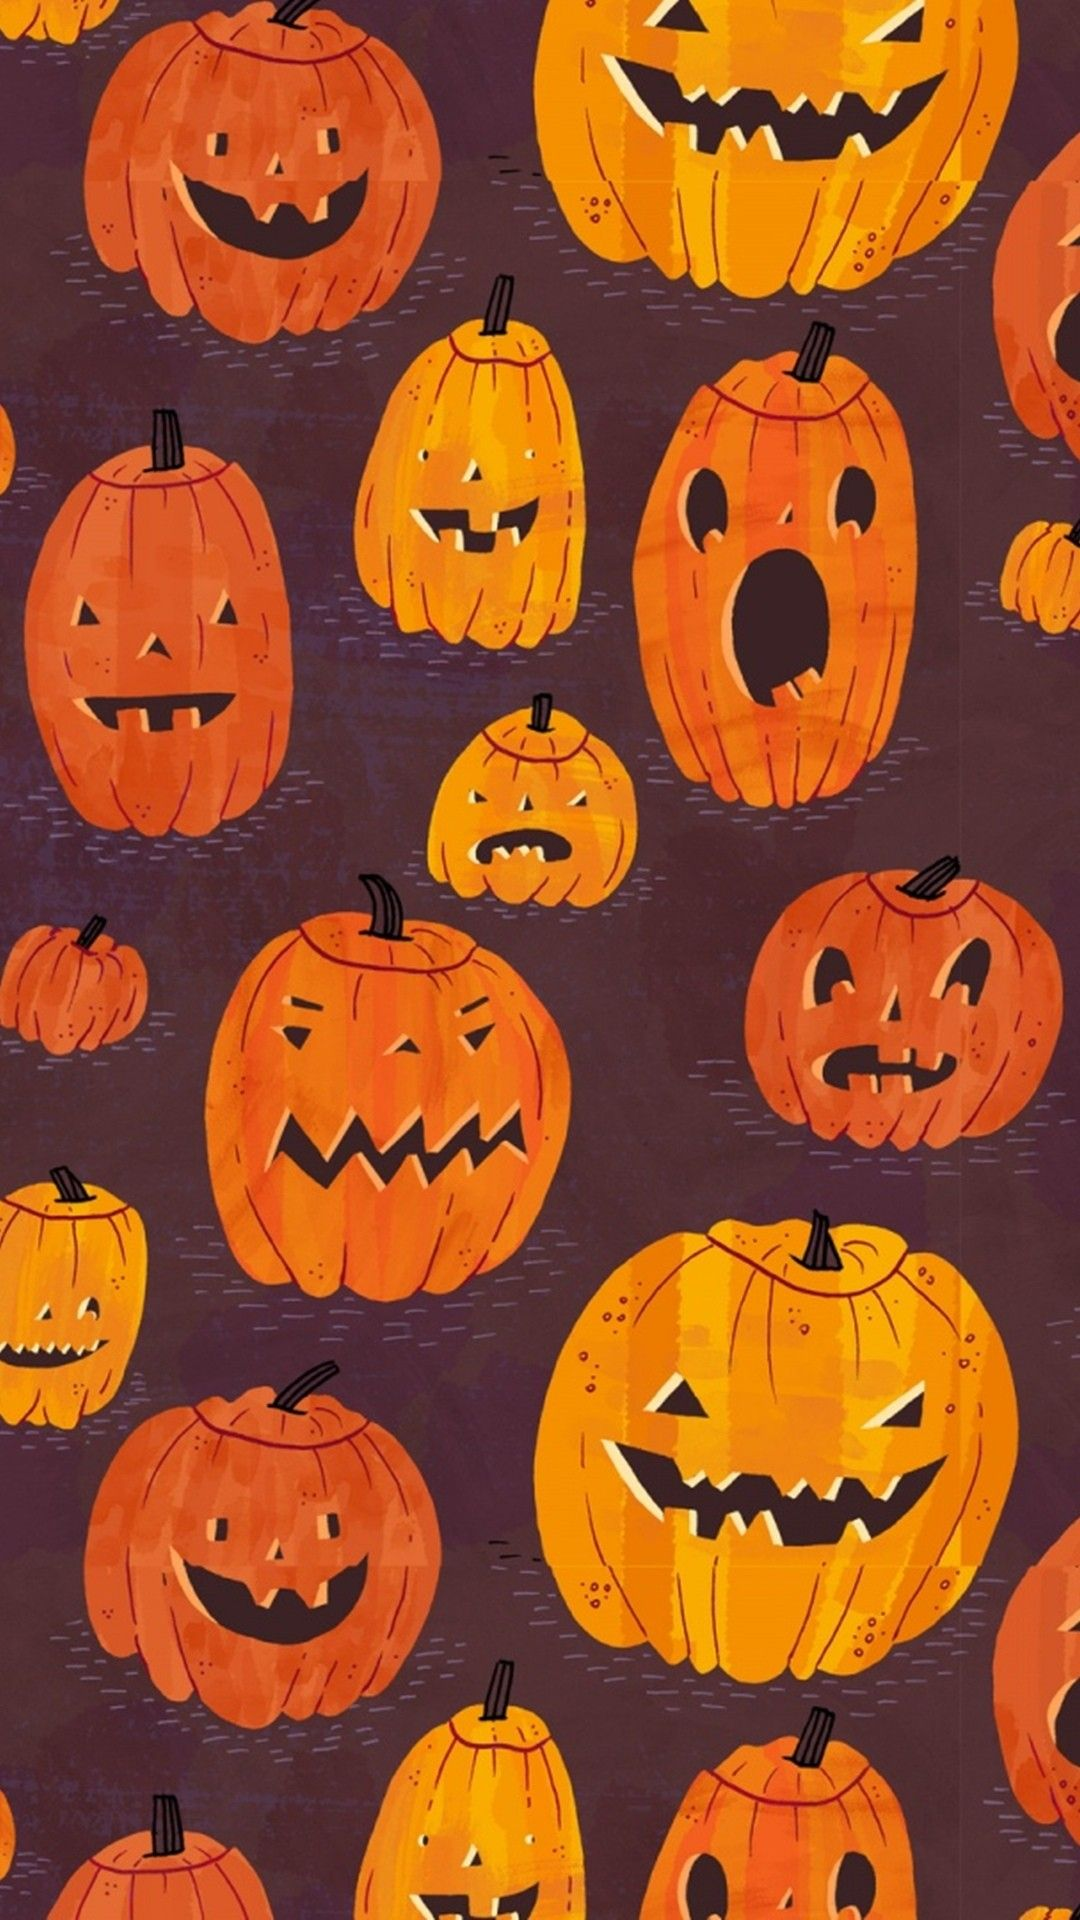 Cute Pumpkin Tap to see more cute halloween wallpaper